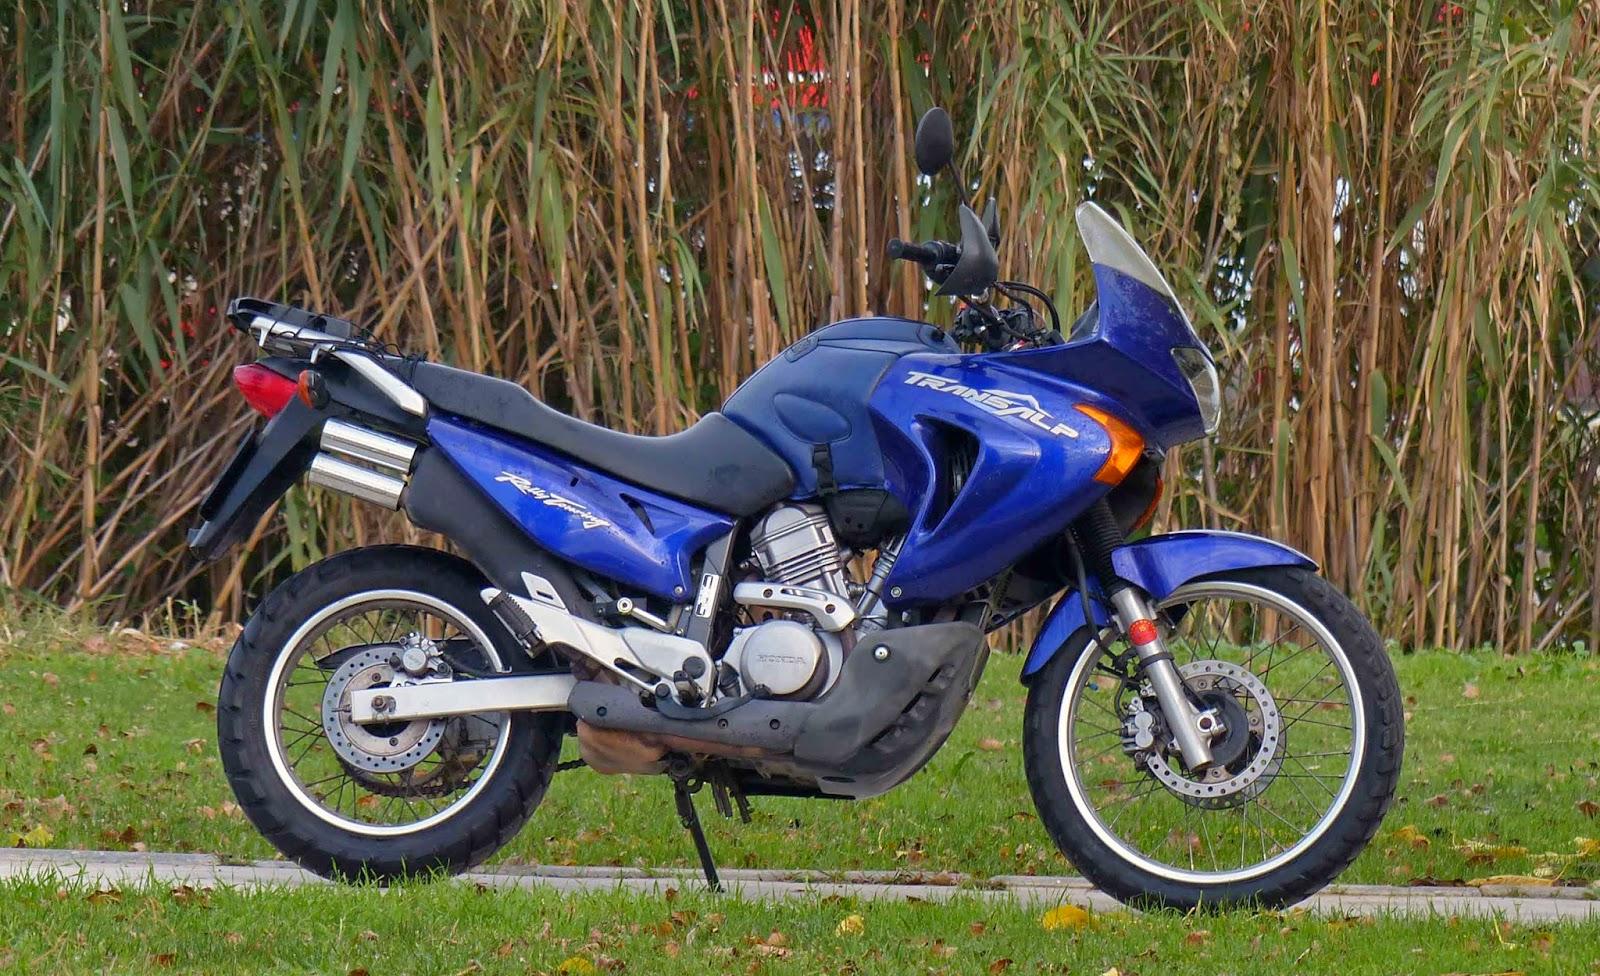 Blog de jose maria alguersuari la moto que no debi morir - Segunda mano plazas de garaje ...